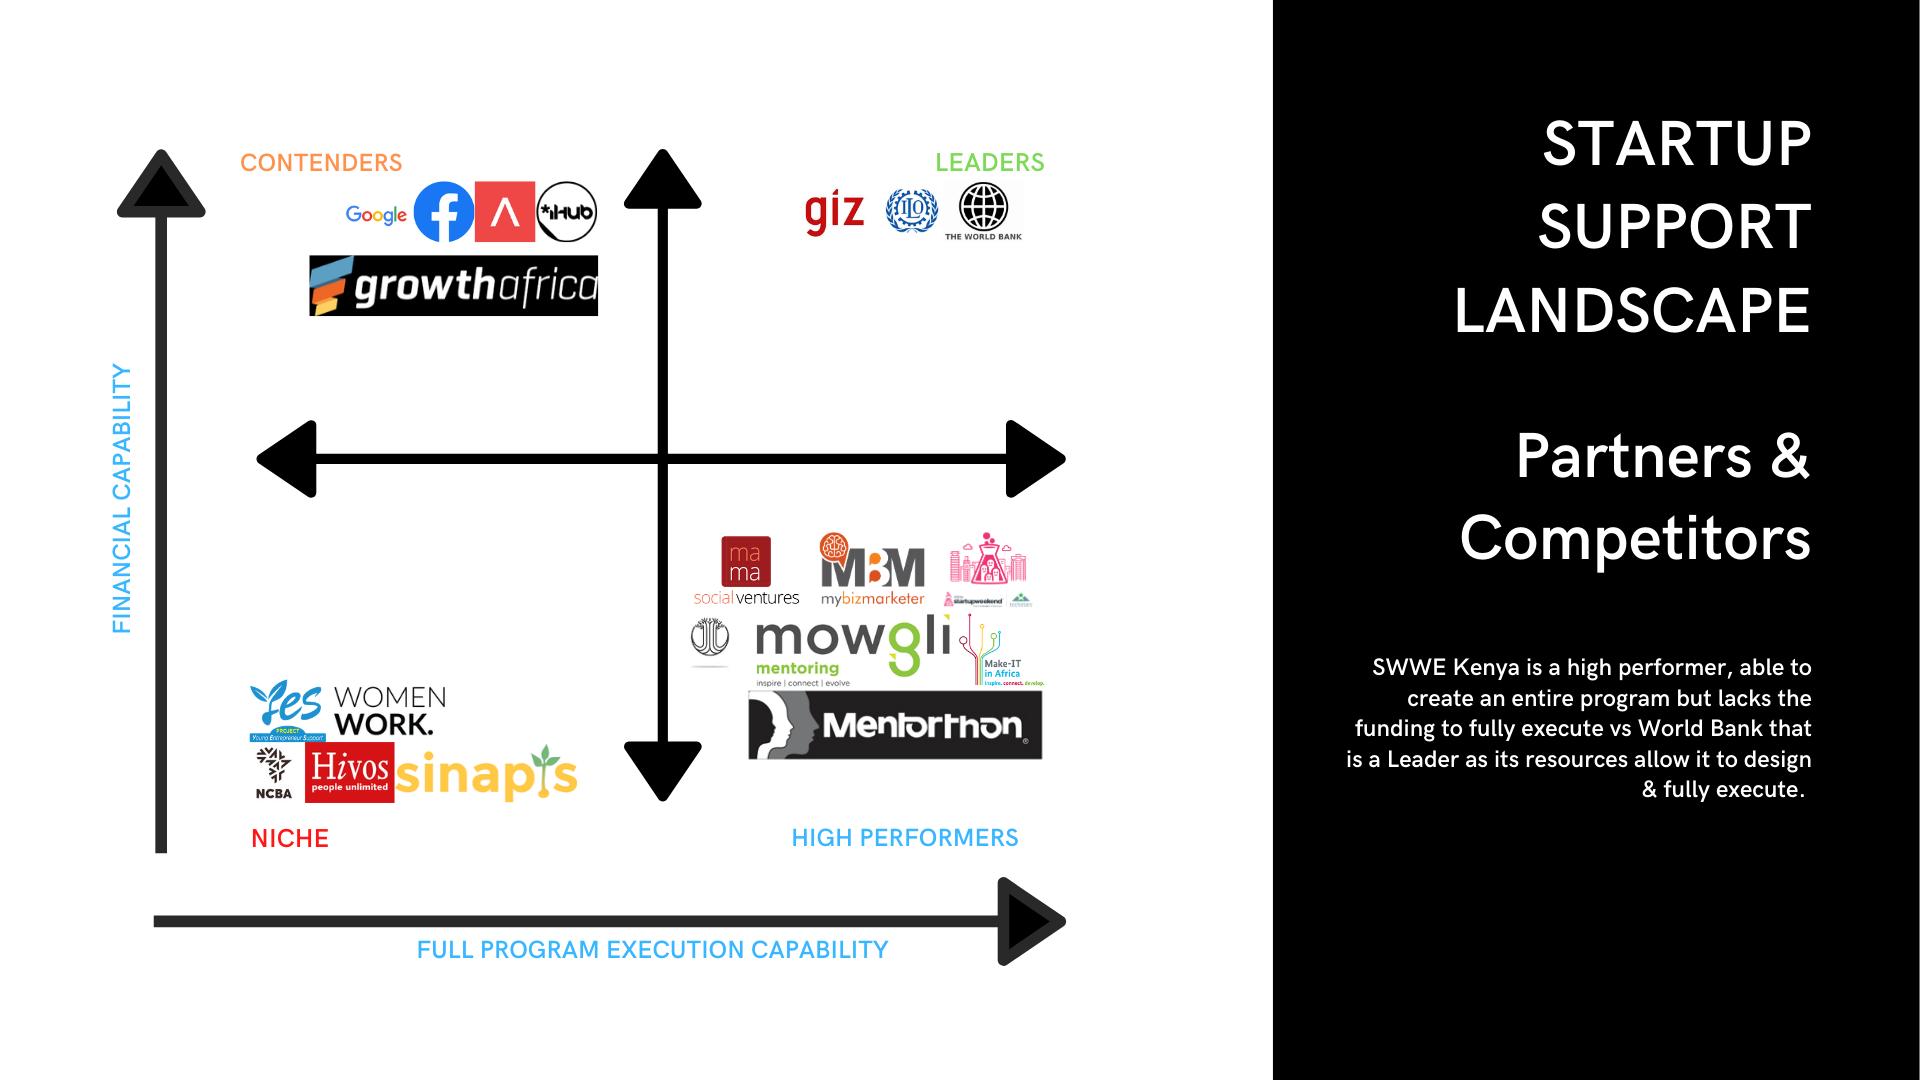 Kenya-Startup-Support-Landscape-Partners-And-Competitors-Header